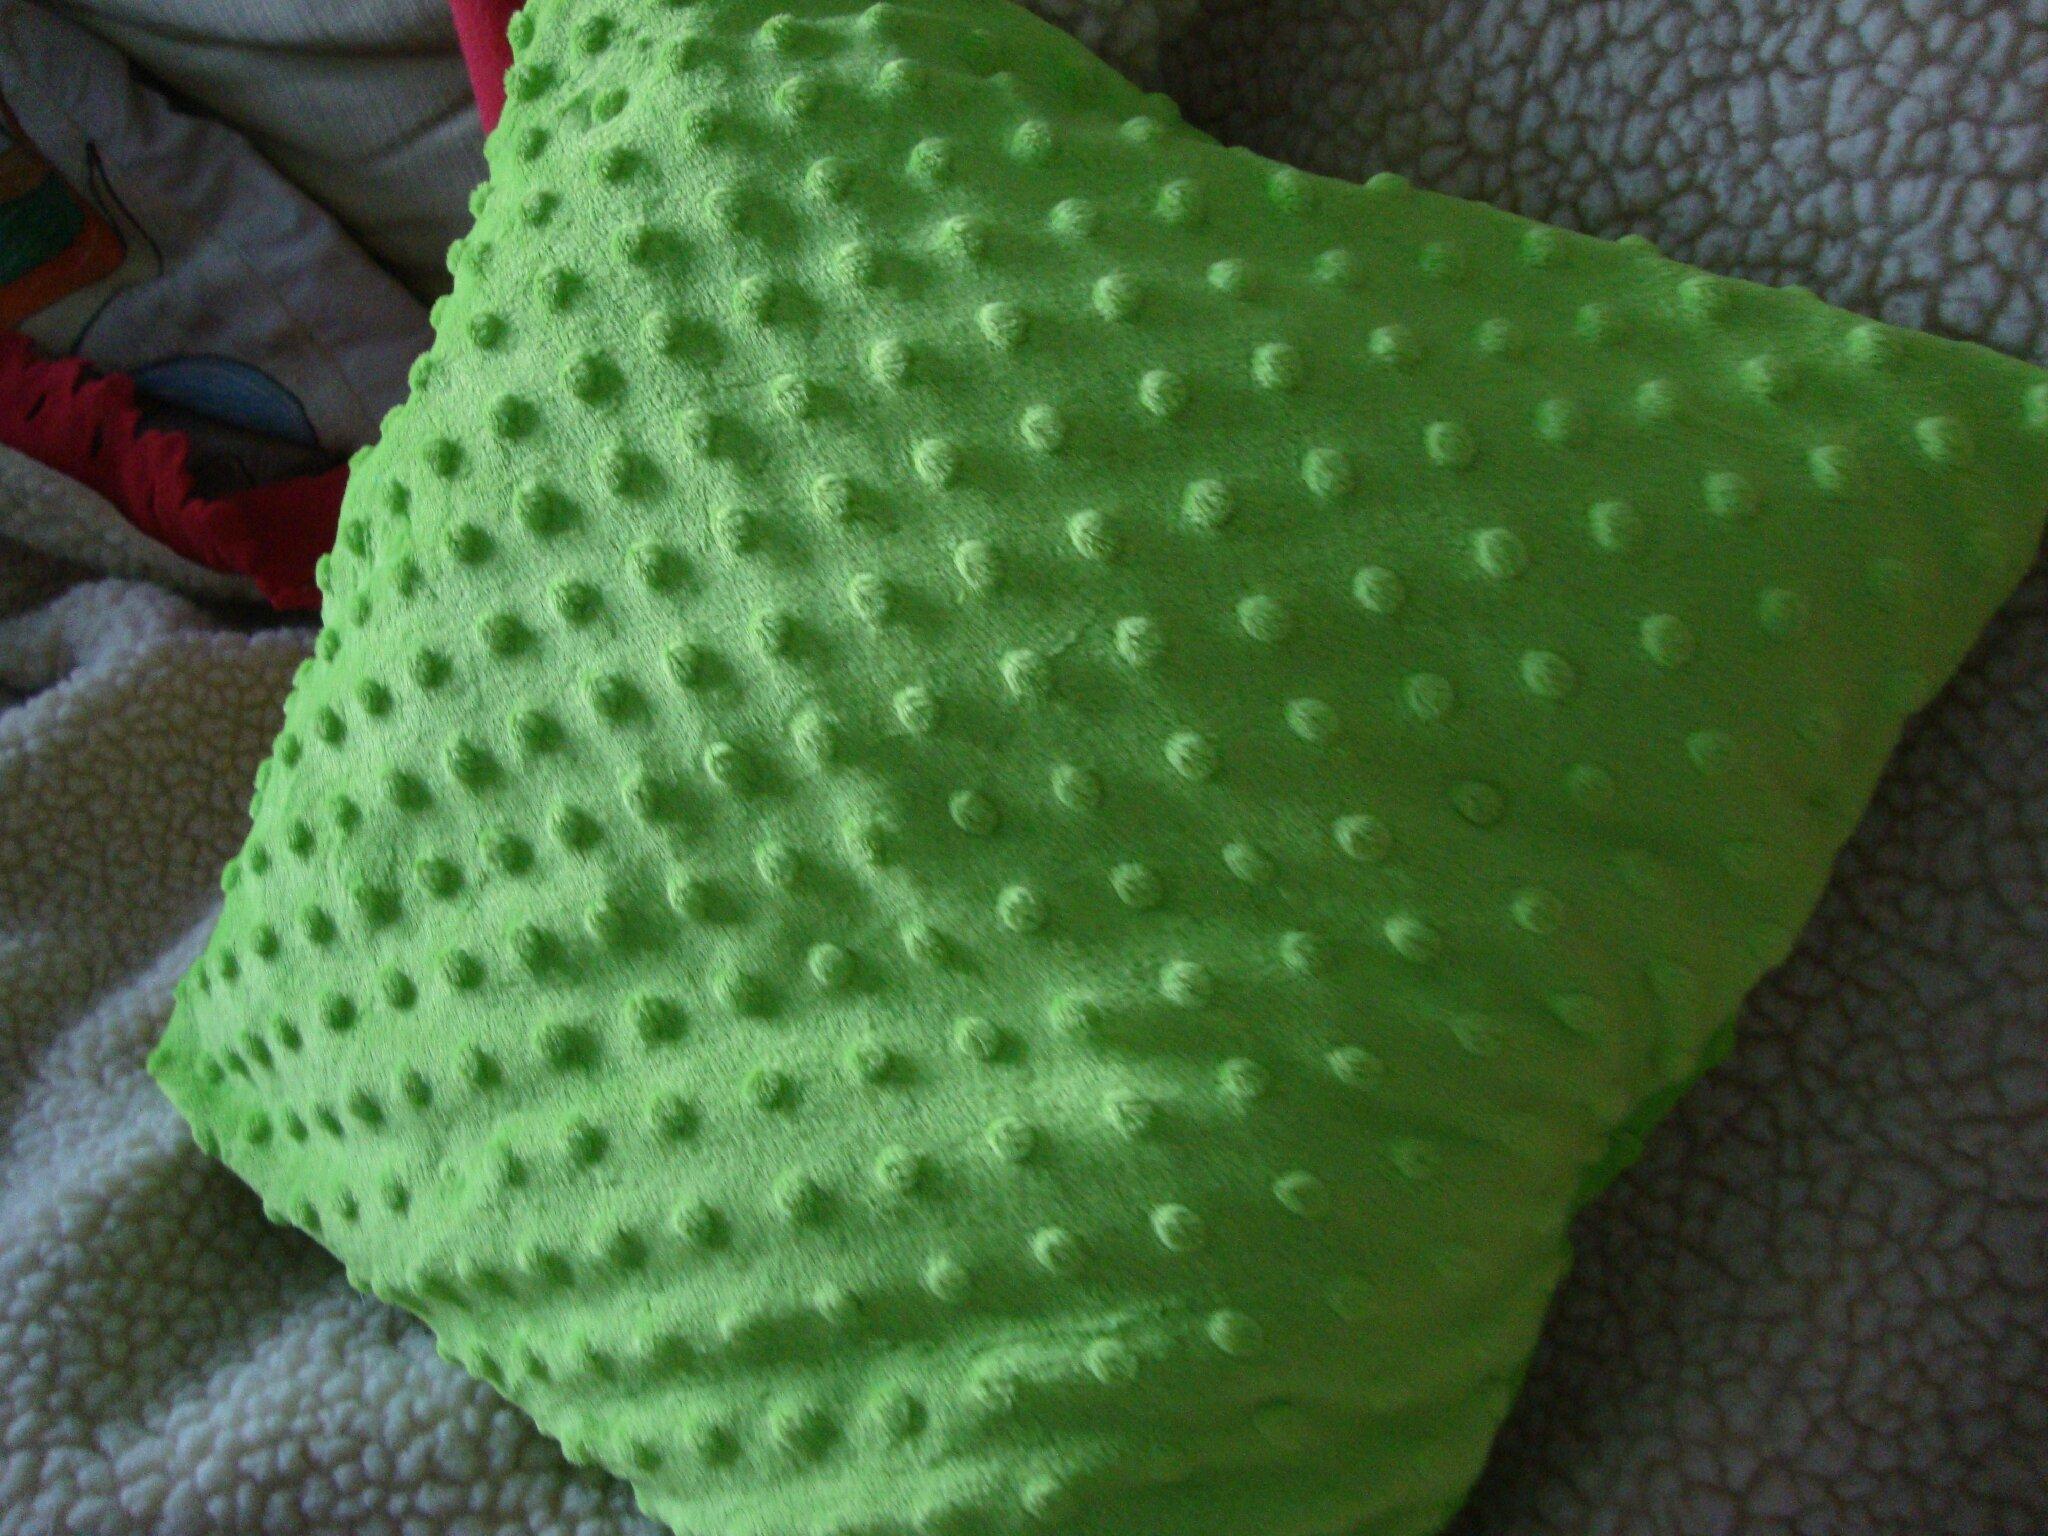 tricot crochet petits coeurs de beurre. Black Bedroom Furniture Sets. Home Design Ideas